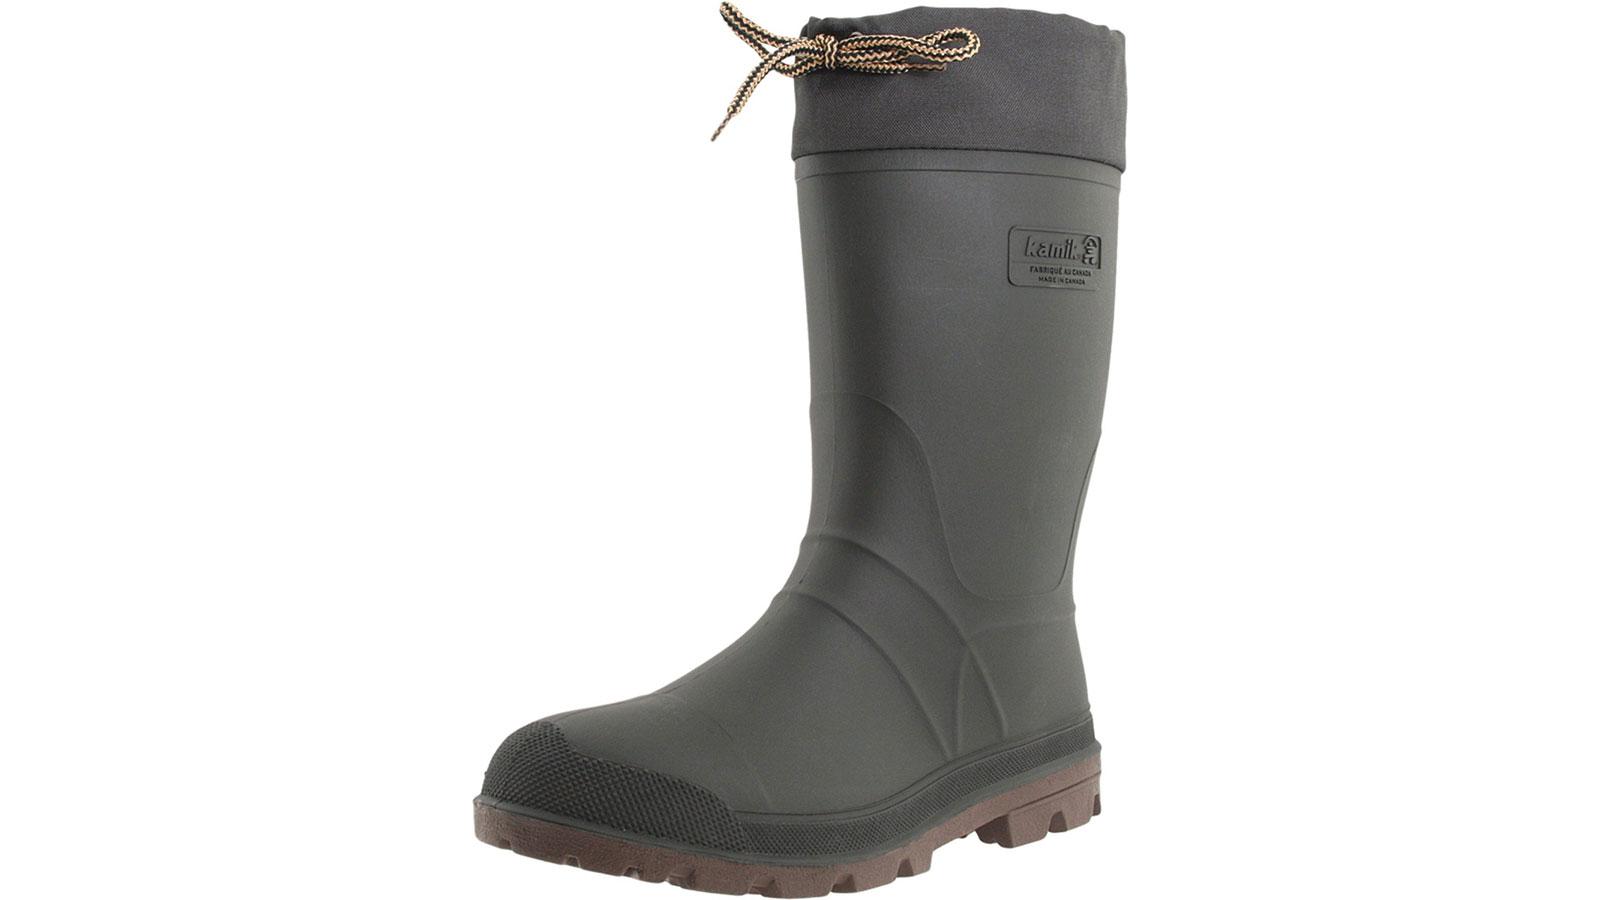 Kamik Icebreaker Men's Rain Boot | the best men's rain boots